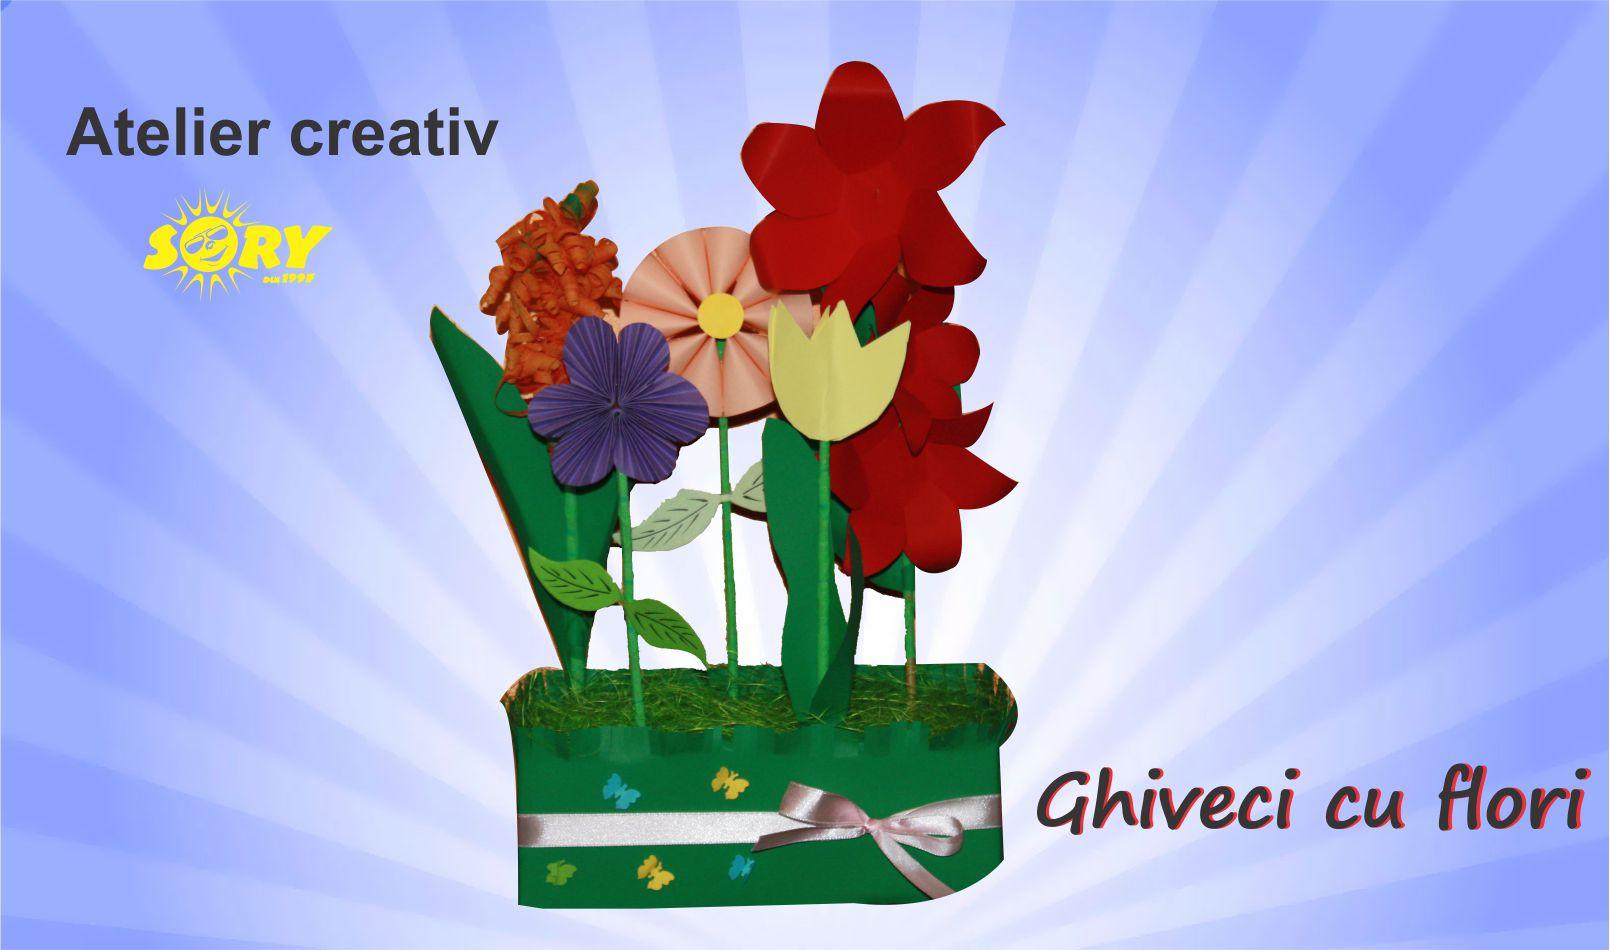 ATELIER CREATIV SORY - GHIVECI CU FLORI